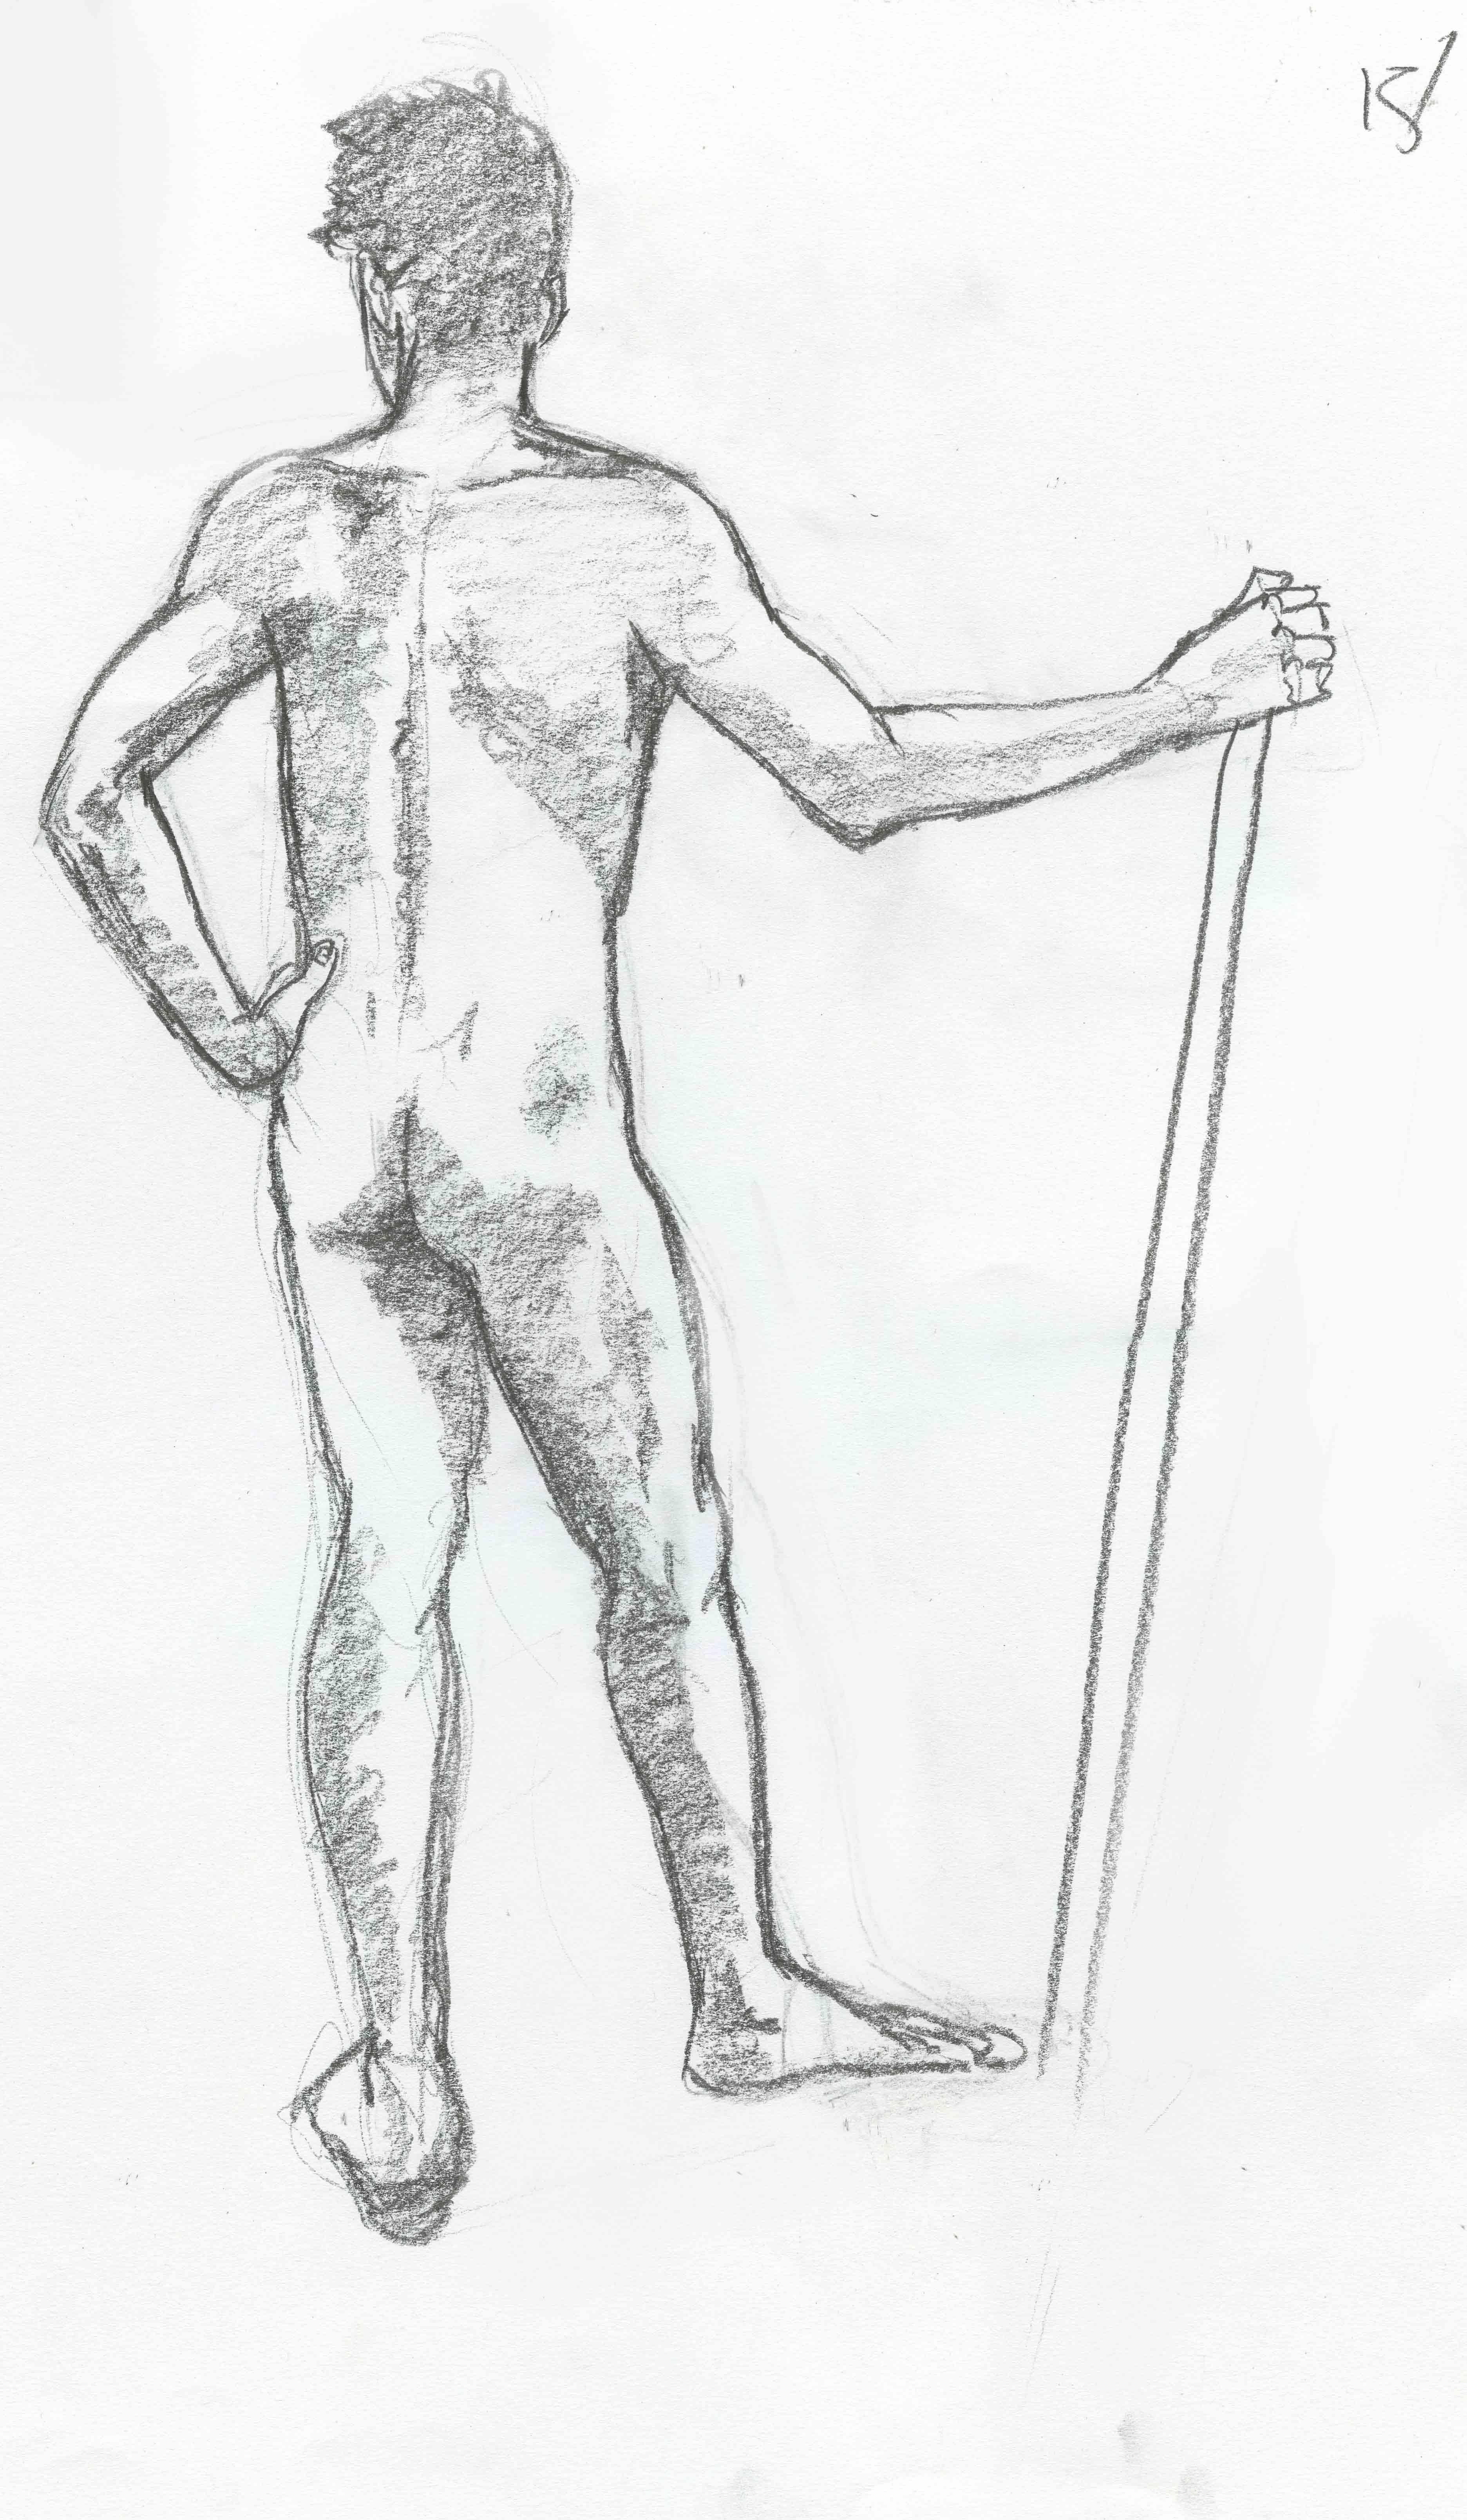 Noomis - Etudes, croquis & Wip [ Nudité ] - Page 6 160927110633825224